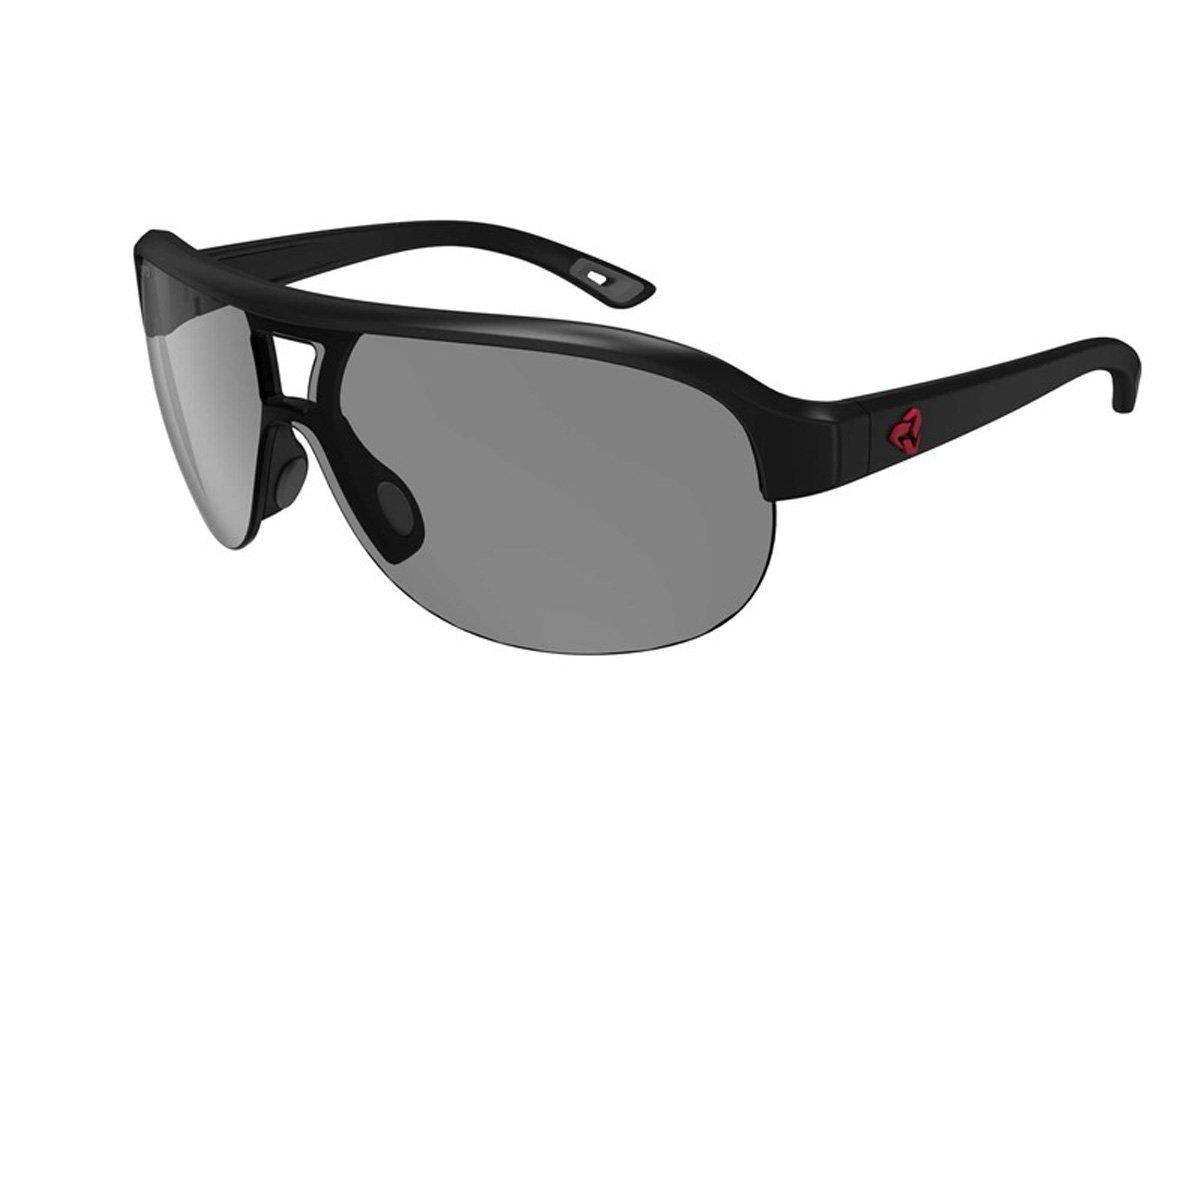 Ryders Eyewear Trestle Photochromicサングラス  BLACK/ GREY LENS 40%-16% B071R6NTCZ